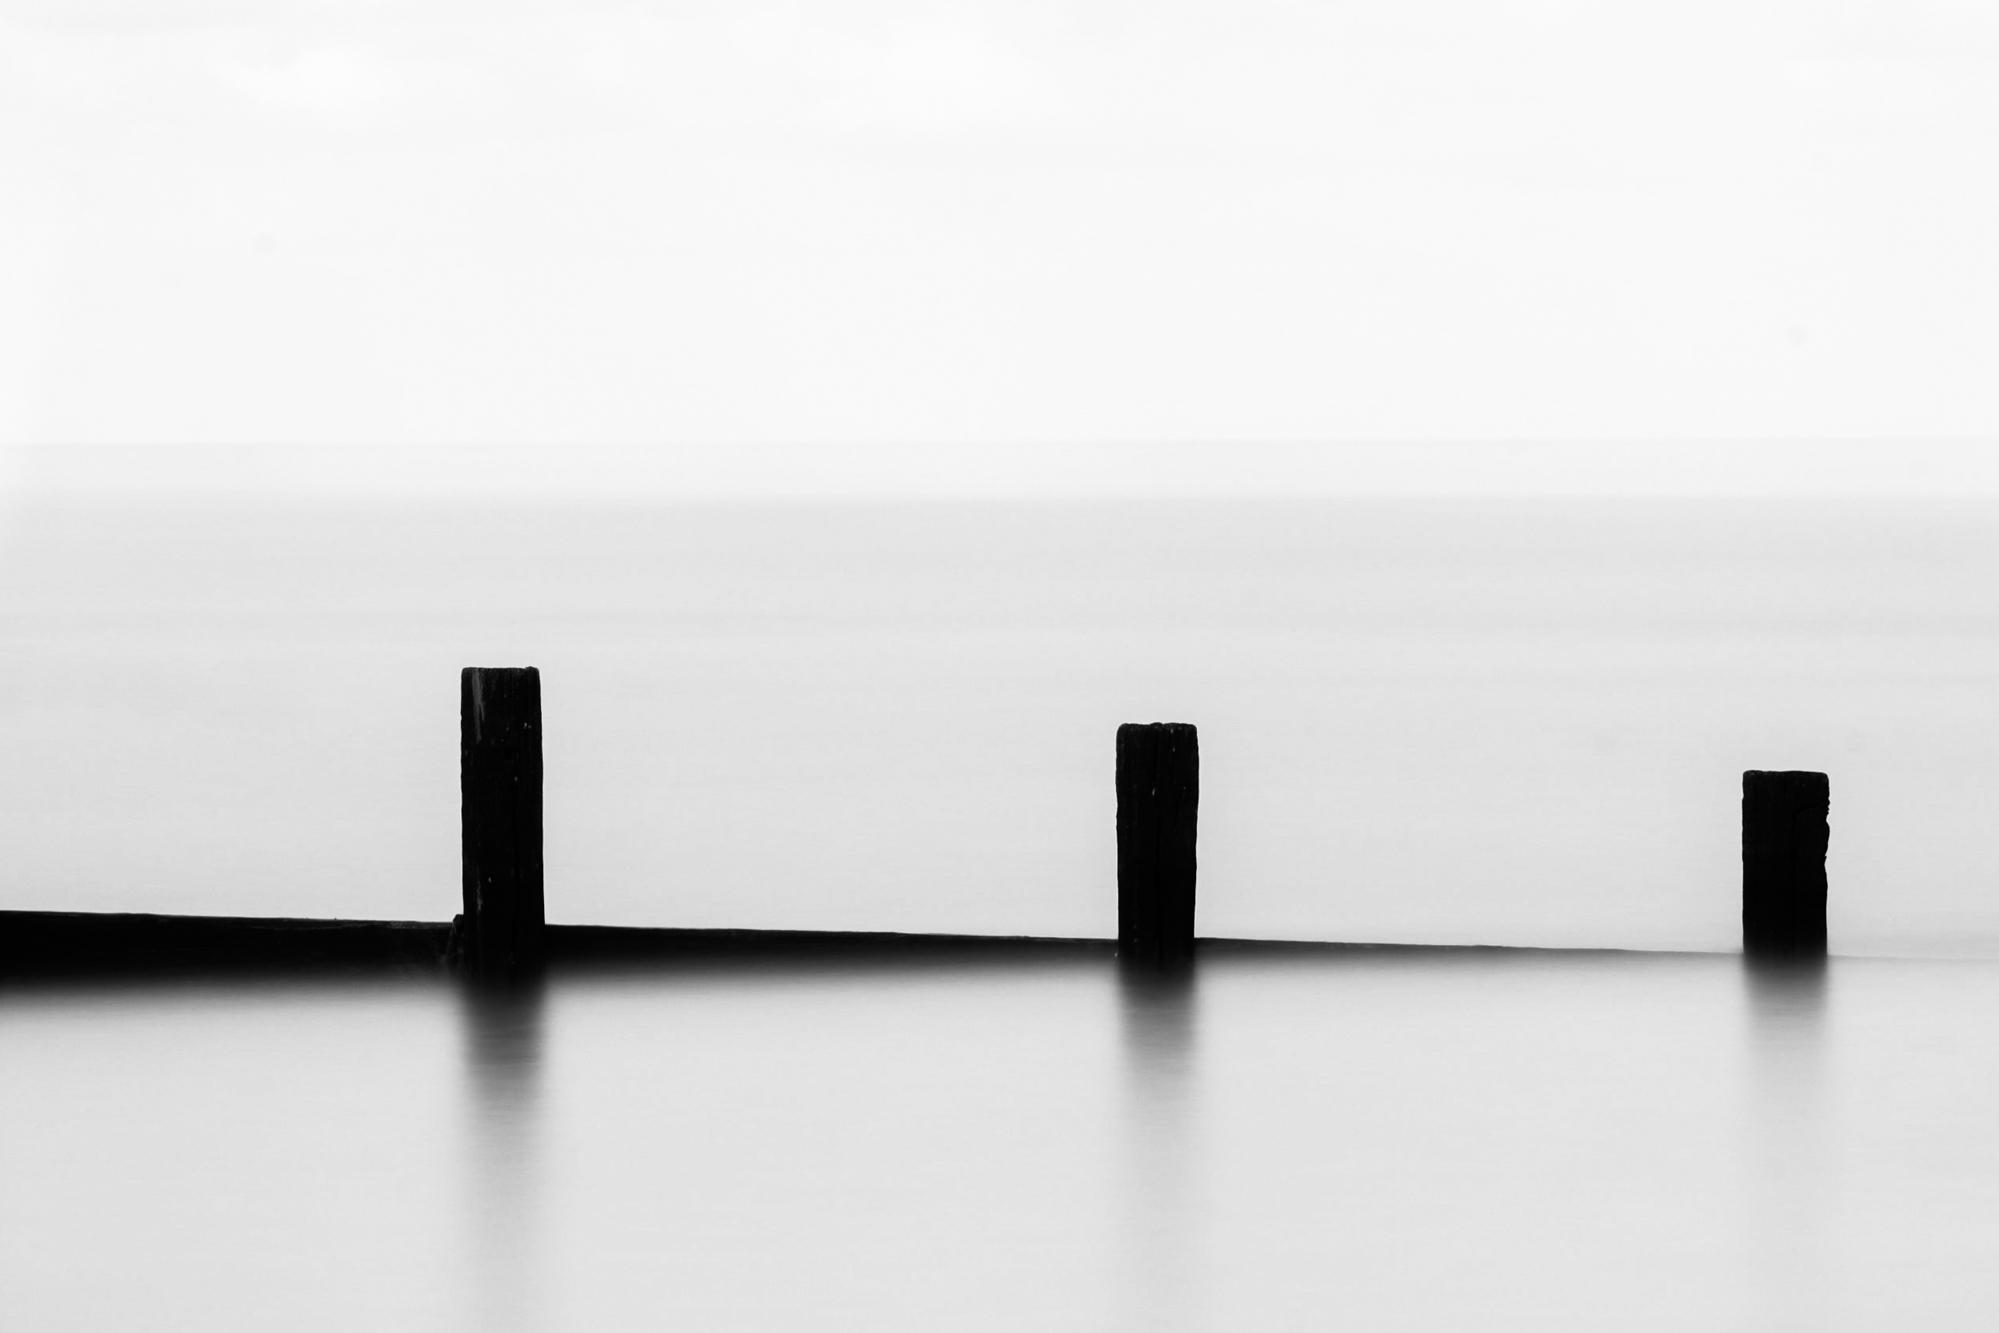 antonyz long exposure landscape minimal photograph of wooden posts in the sea